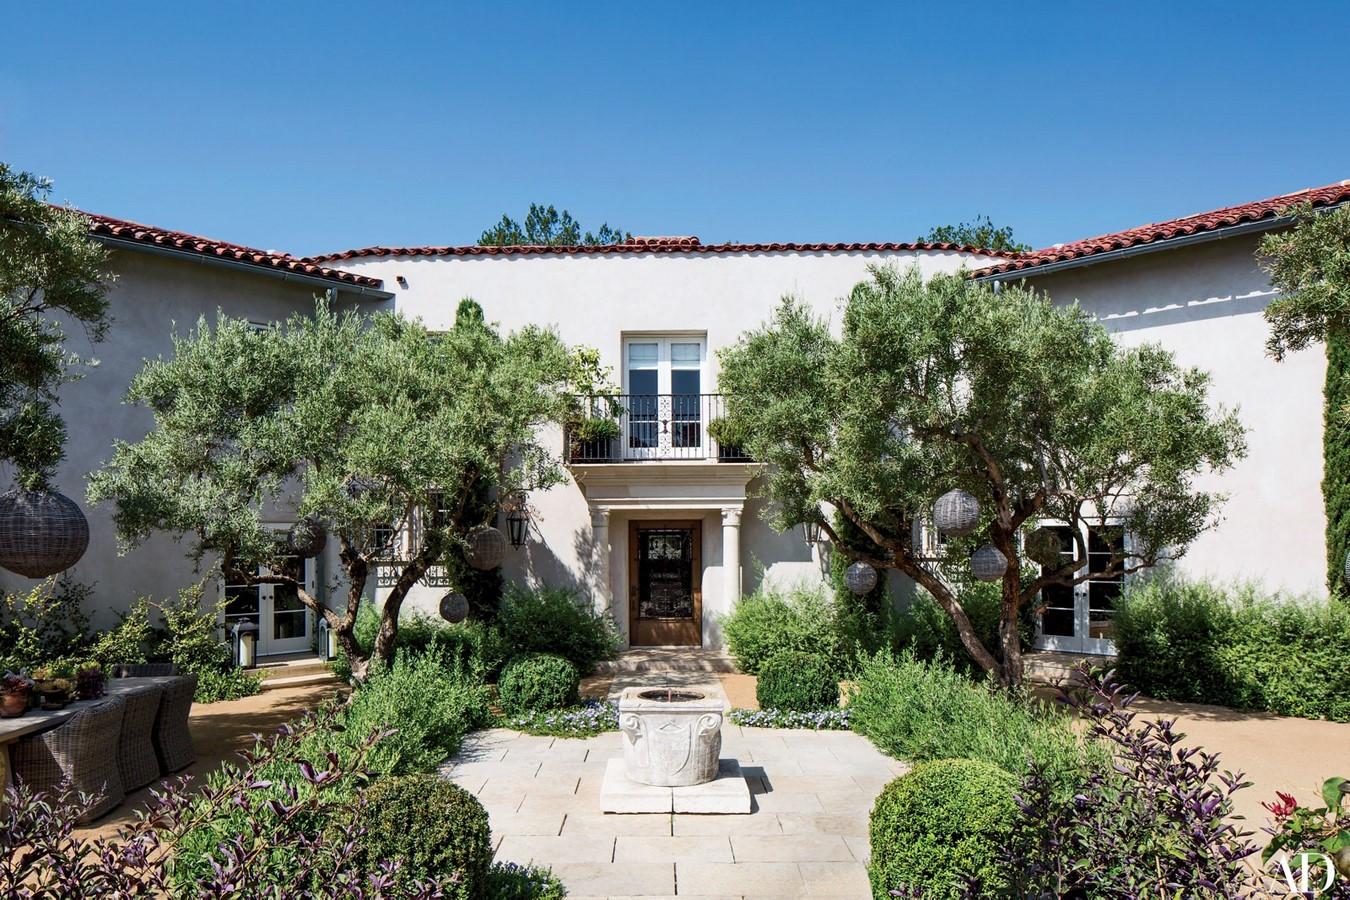 Ellen Pompeo's House, Los Angeles, USA - Sheet1